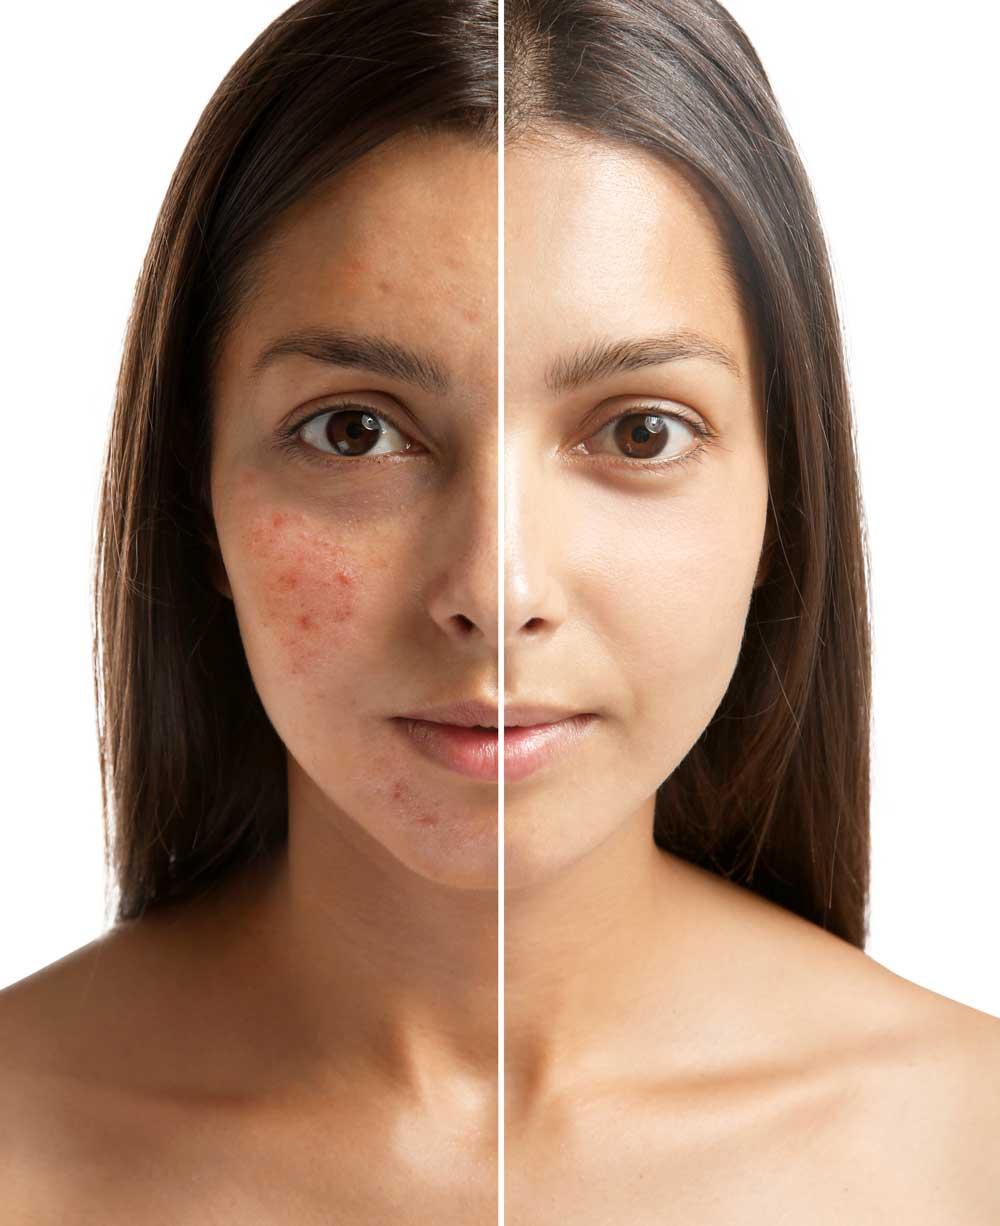 tratamiento acne dr pablo trocez